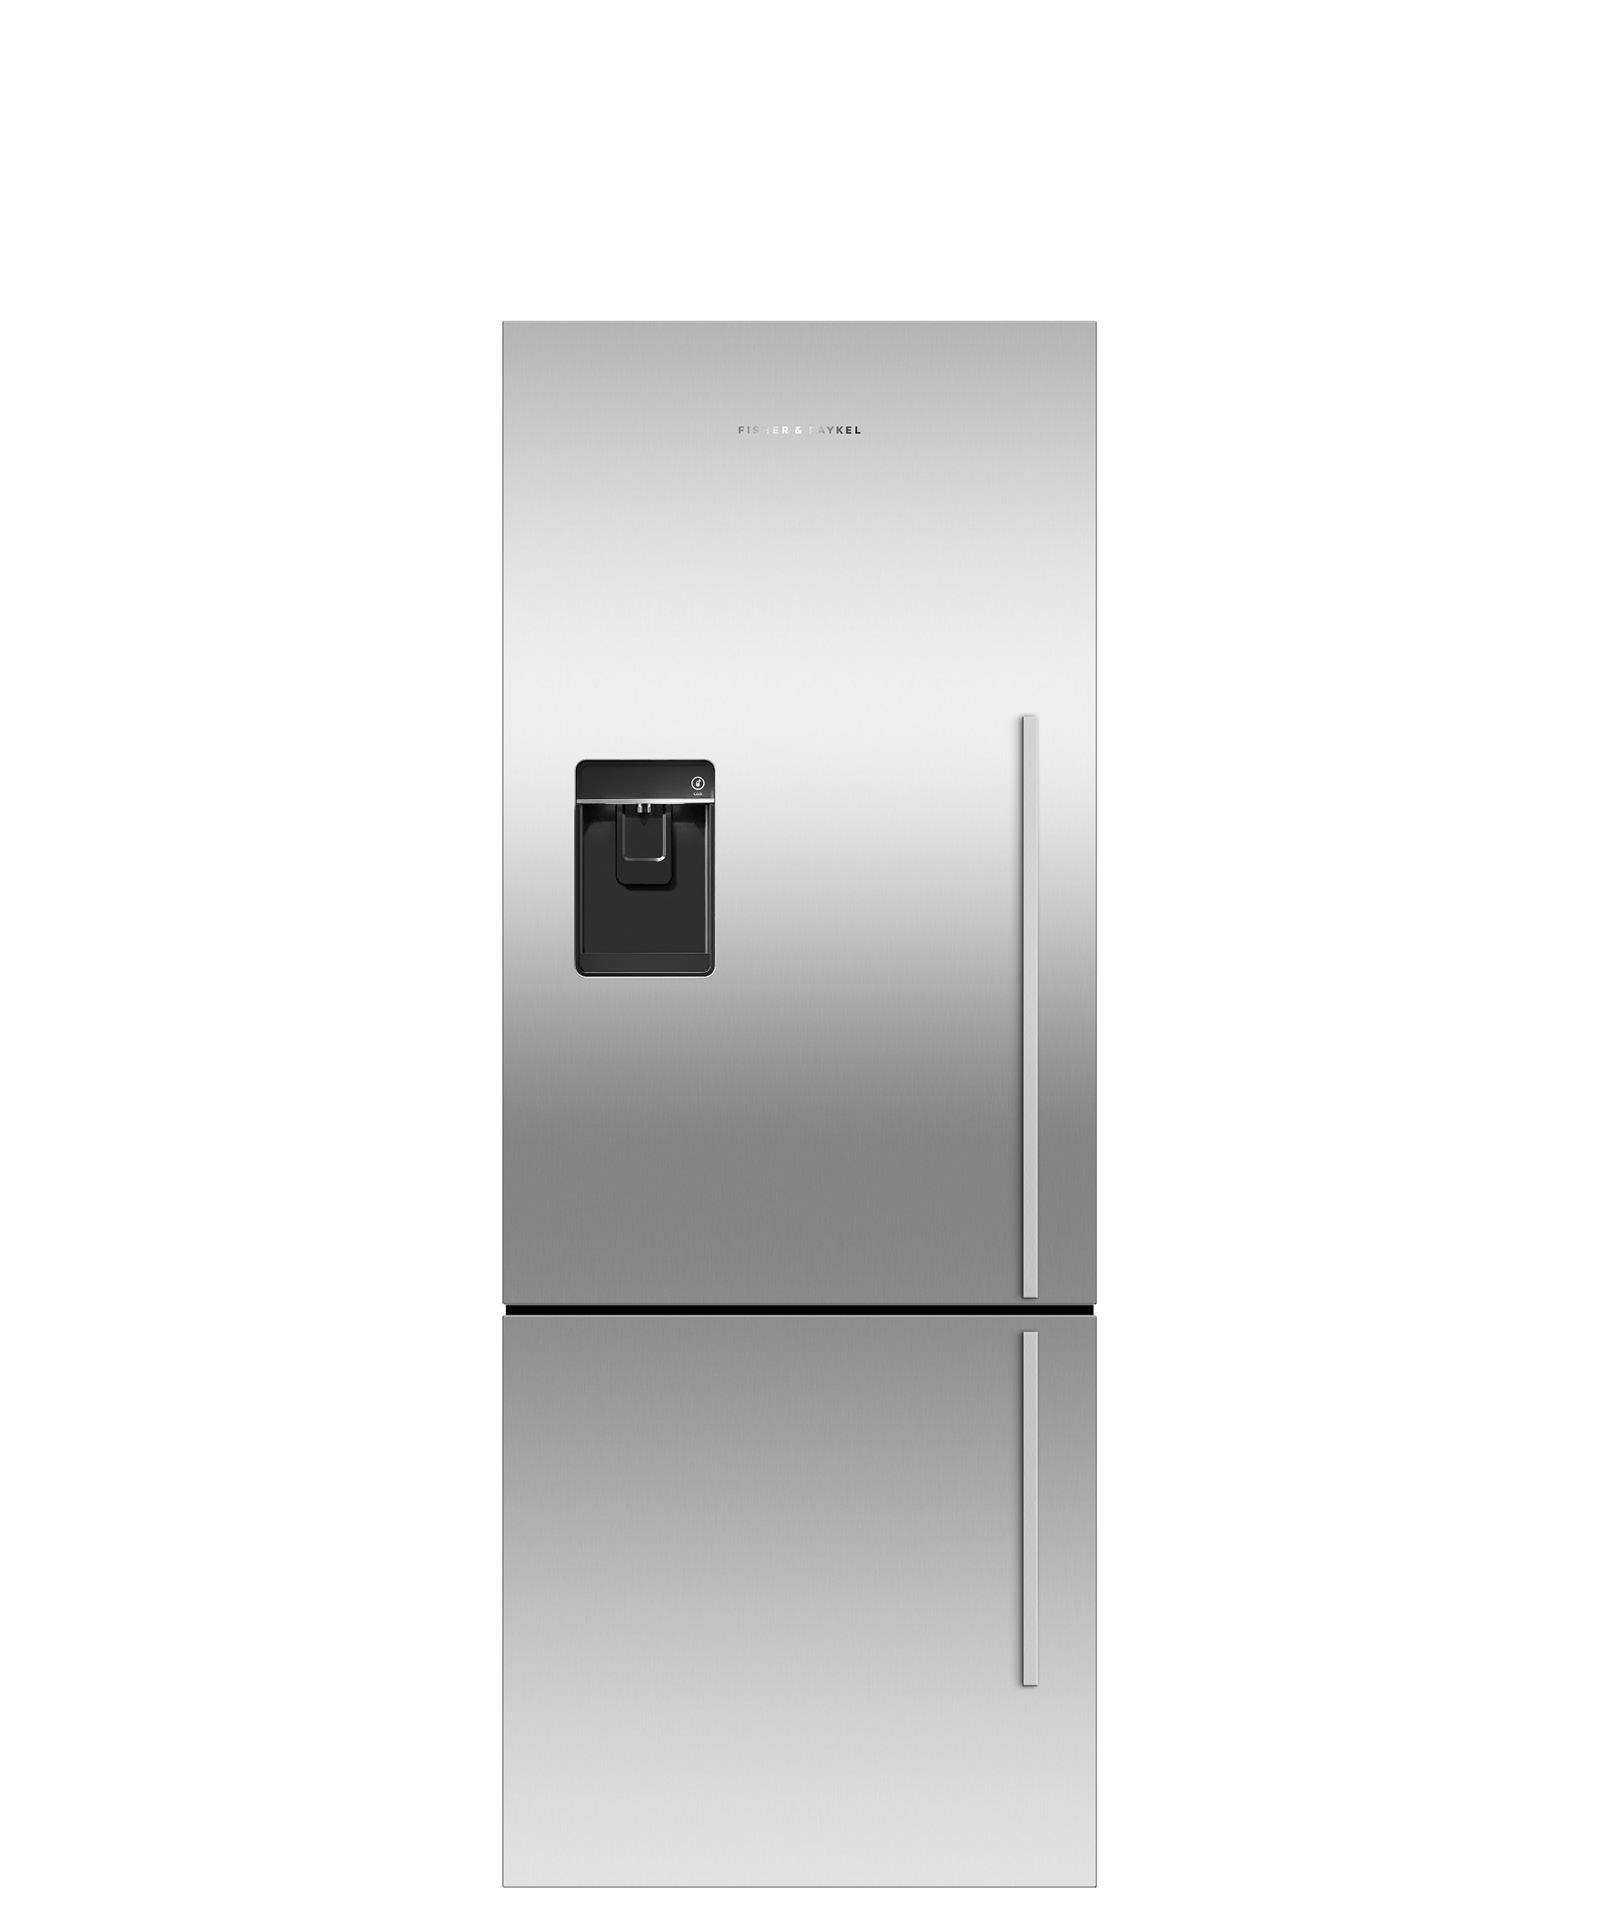 DISPLAY MODEL--Counter Depth Refrigerator 13.5 cu ft, Ice & Water